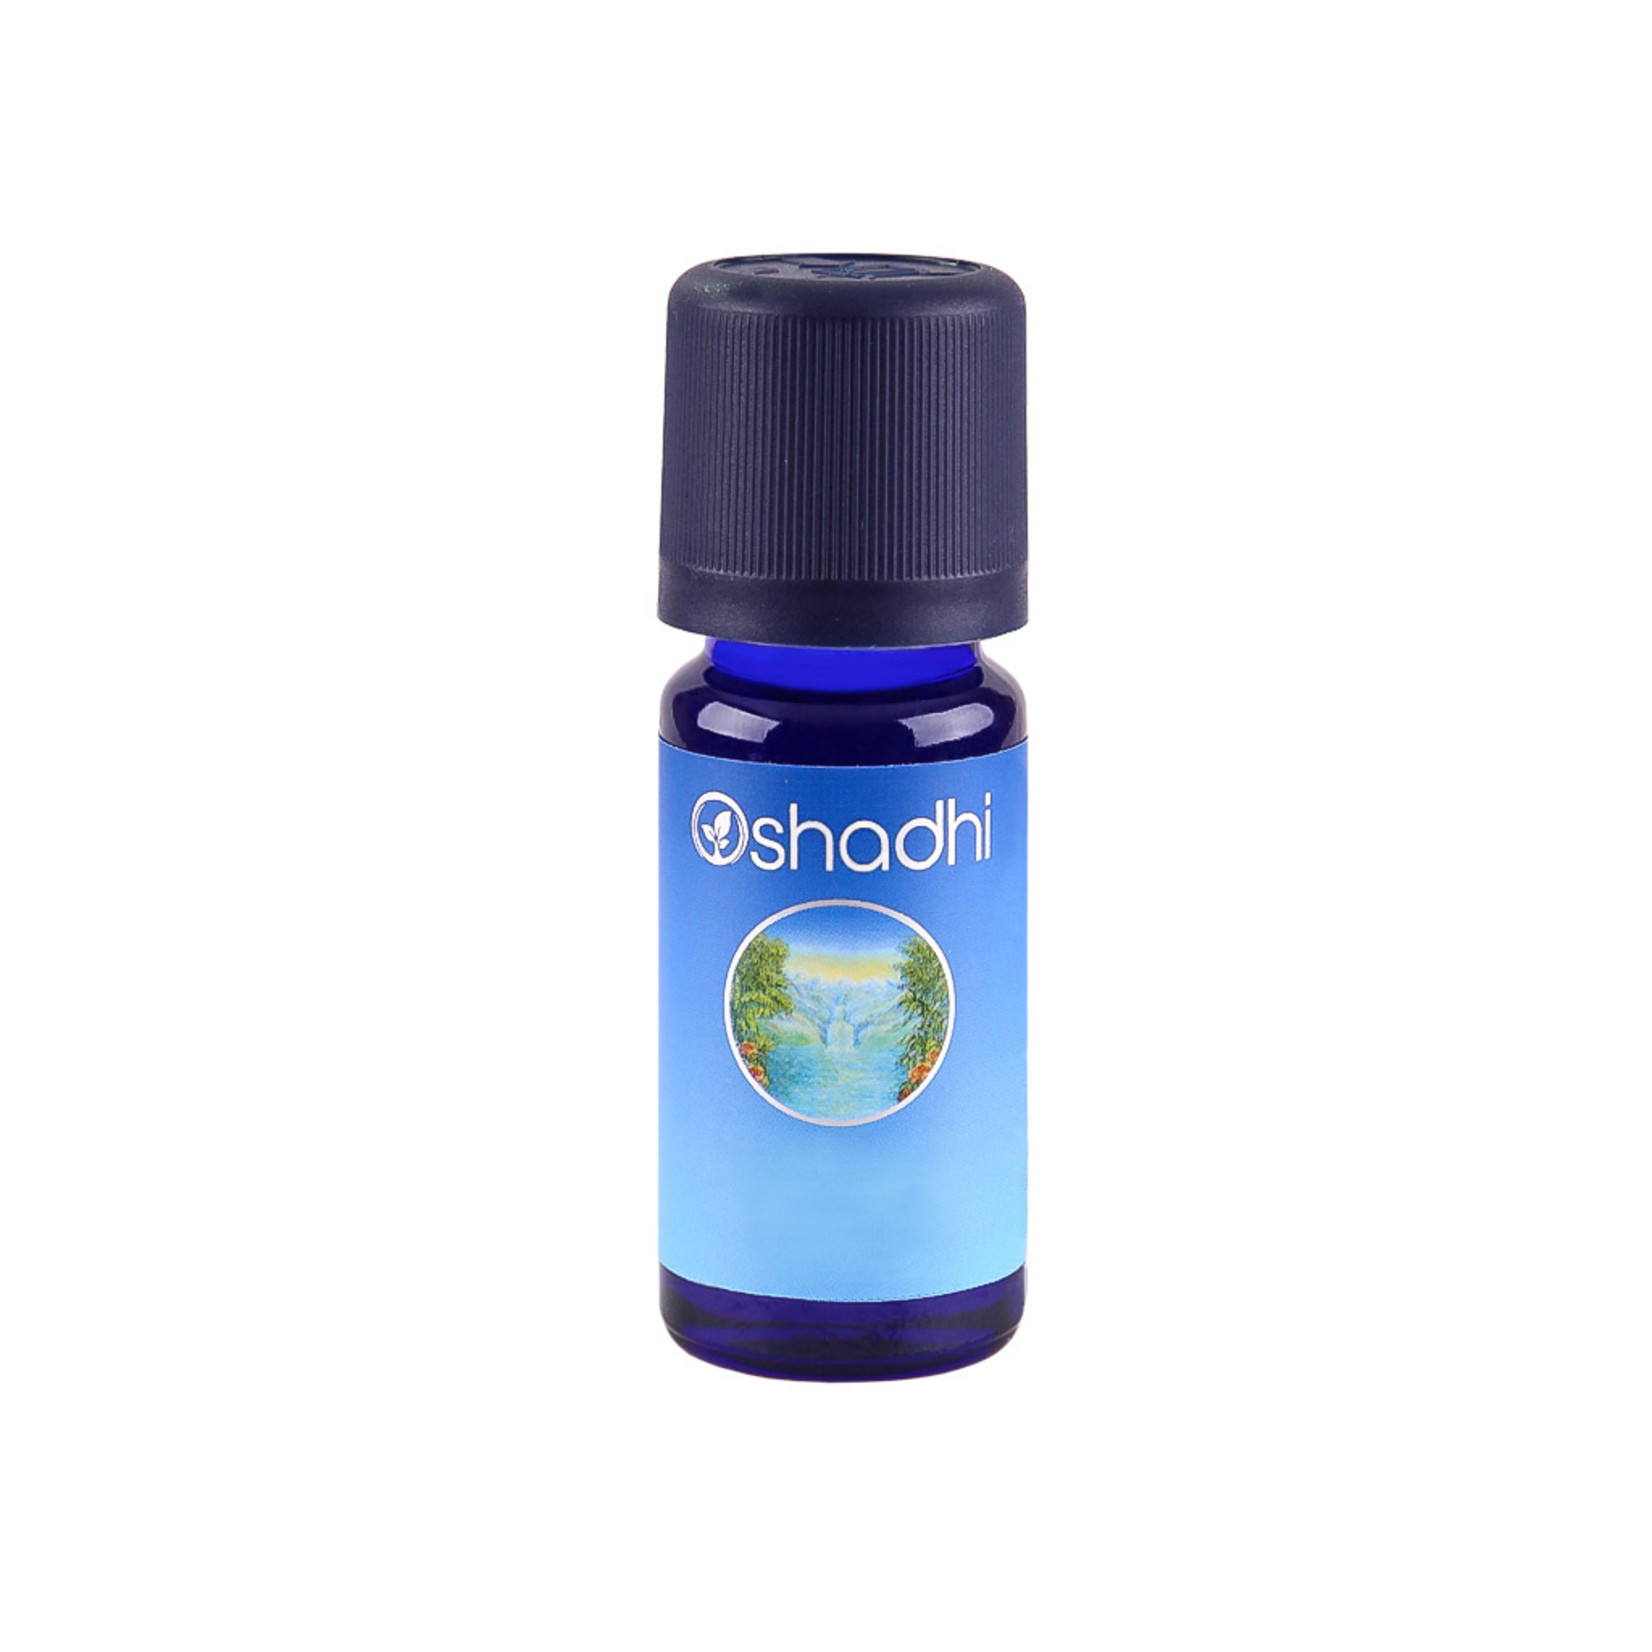 Oshadhi Oshadhi Copaiba - helende krachten uit de balsemboom - troost & heling - 10ml